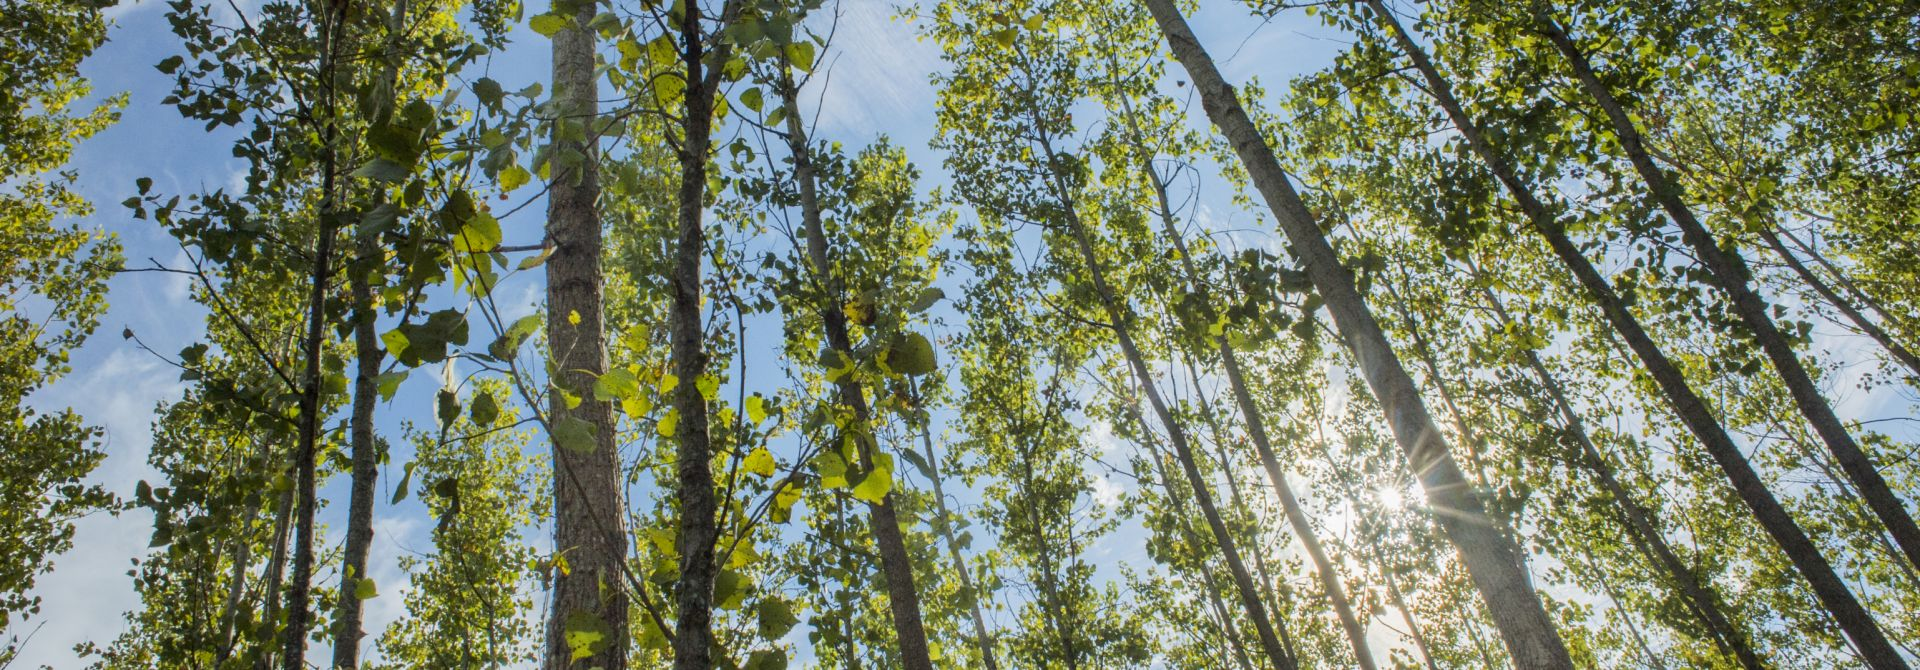 Lower Mississippi Valley Reforestation